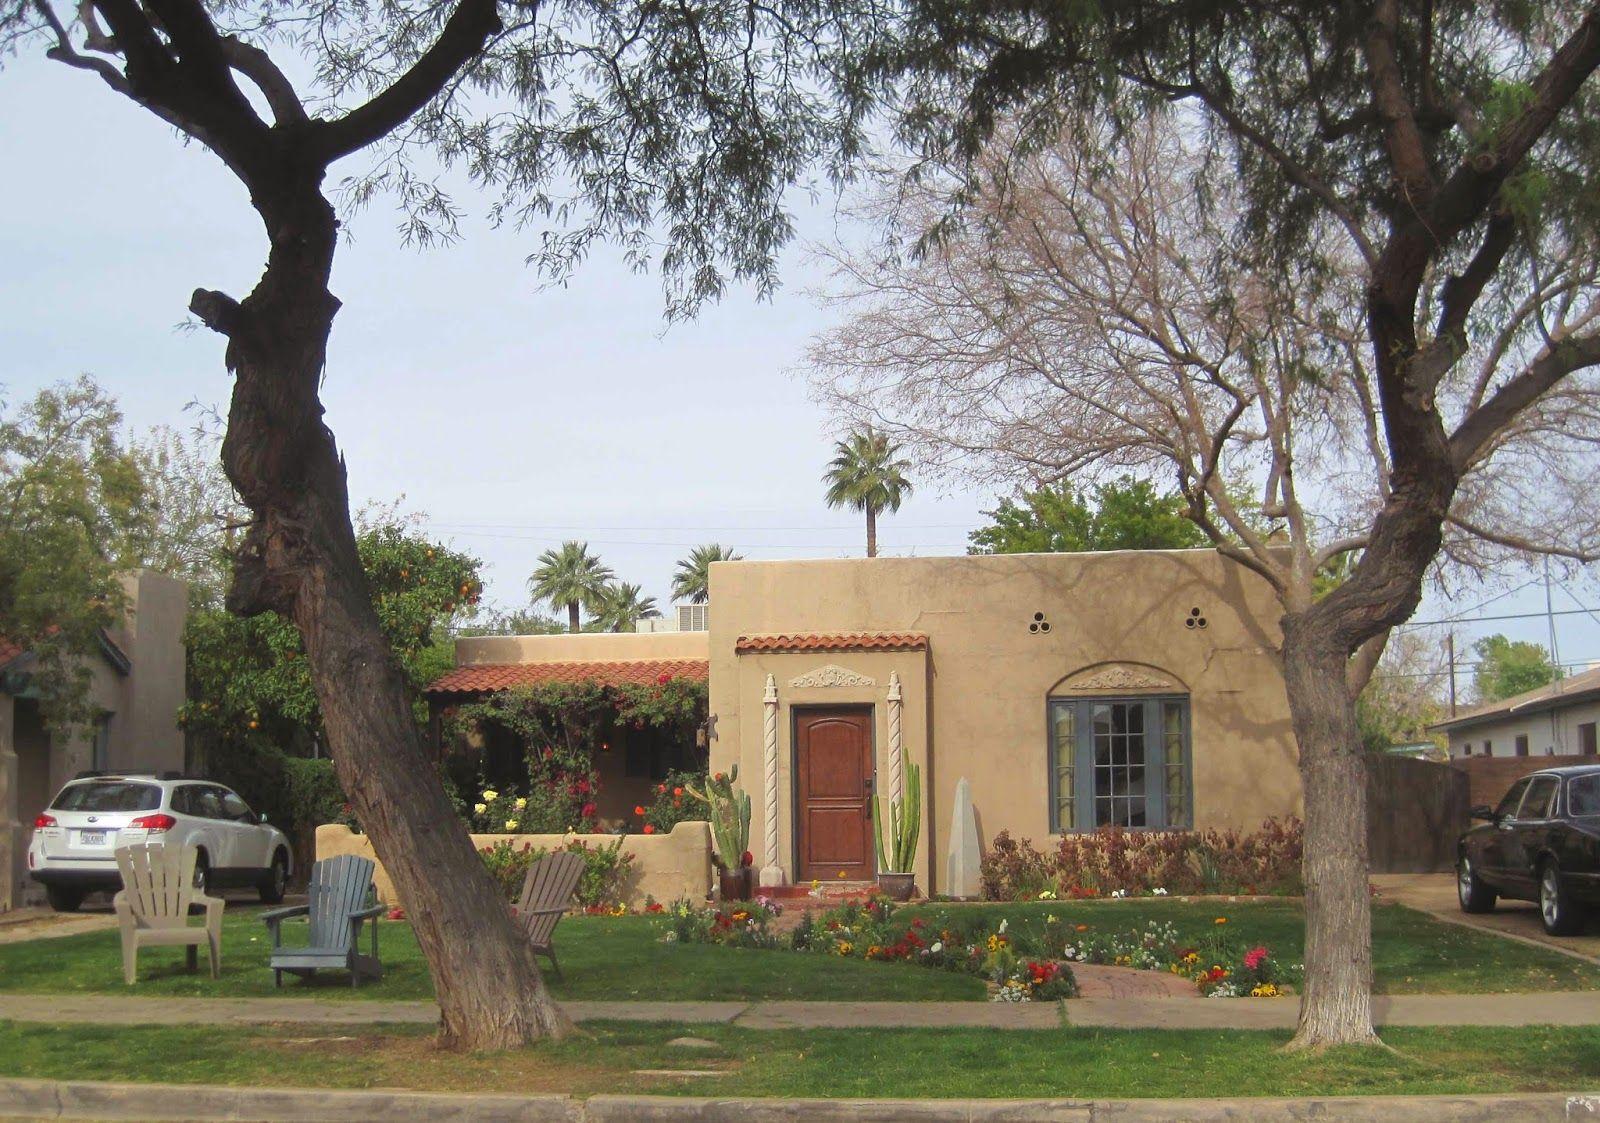 Small Pueblo Revival Style Homes Arizona Google Search House - Adobe home design